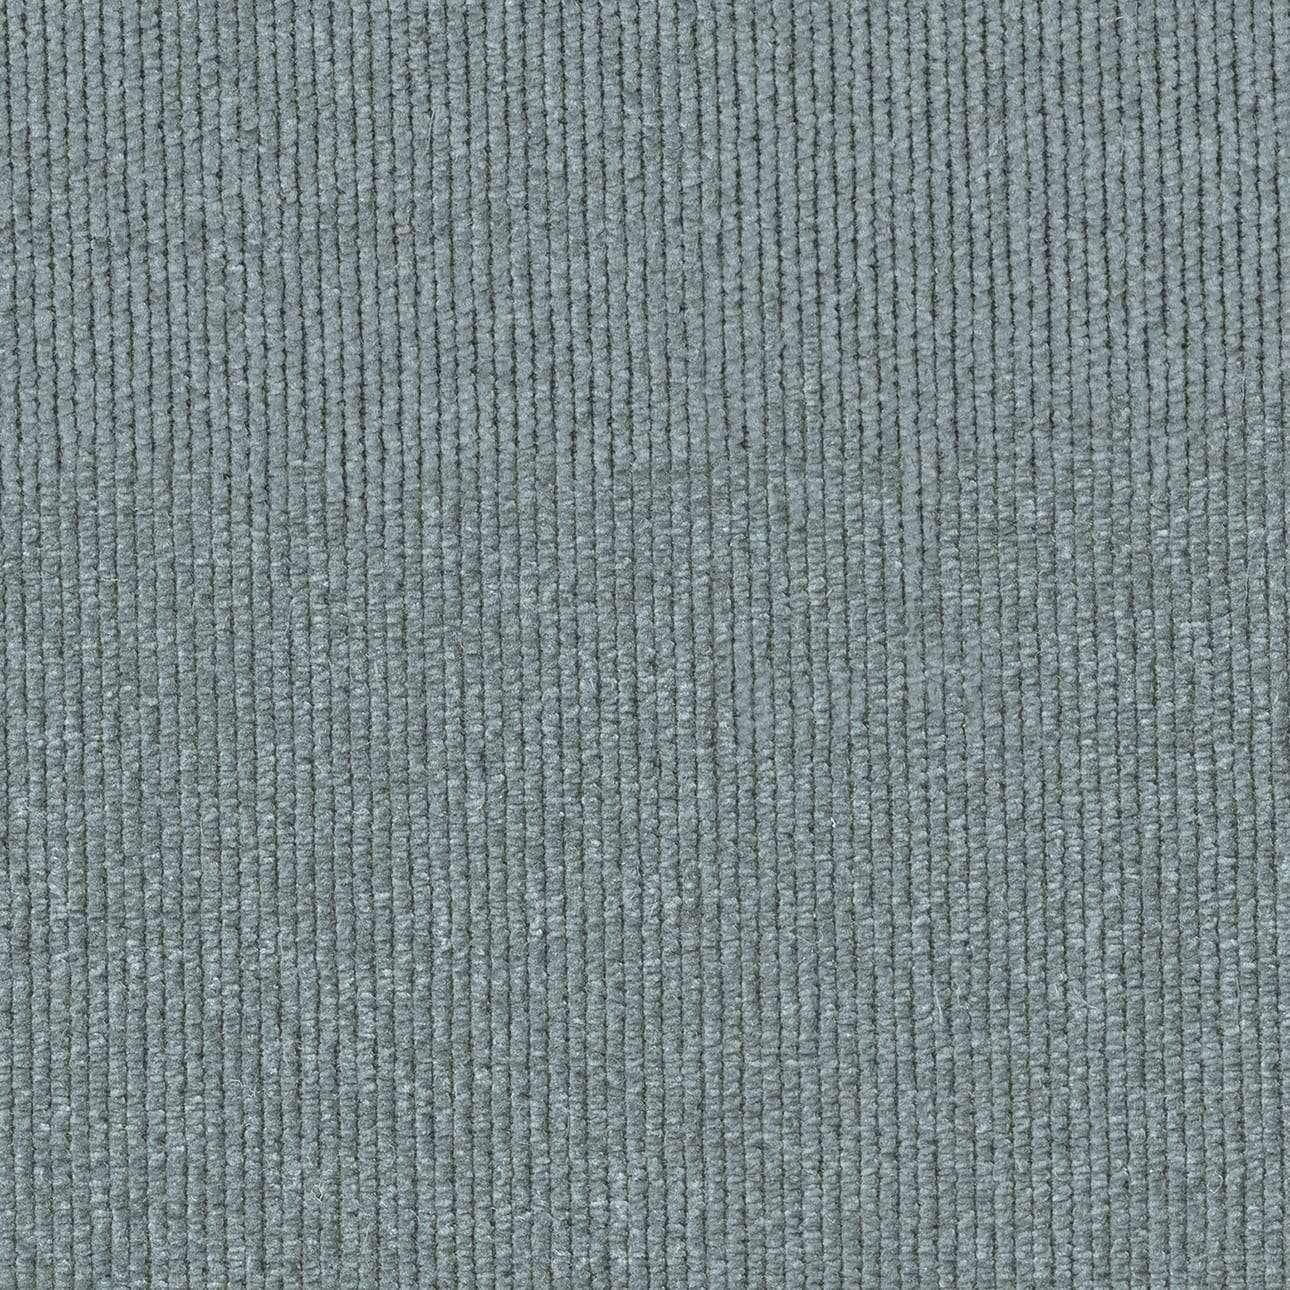 Poszewka na poduszkę Tylösand 1 szt. w kolekcji Living, tkanina: 161-66